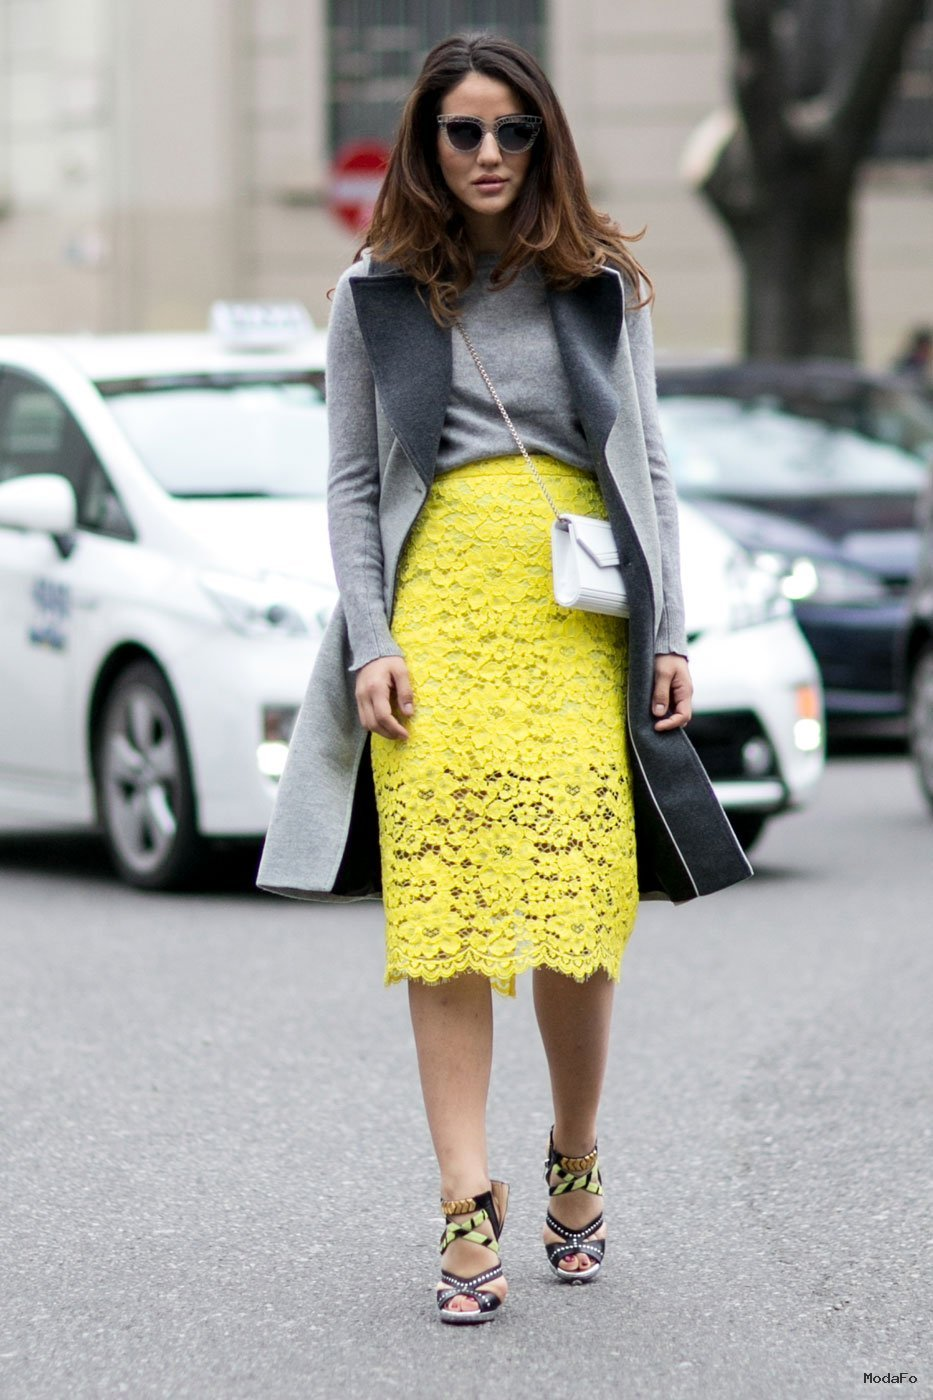 Street Style From Milan Fashion Week Fall-Winter 2015-2016 ... - Uzun hırka modelleri Uzun Hırka Kombinleri Uzun Hırka Modası Uzun Kış Modası Hırka Kombinleri